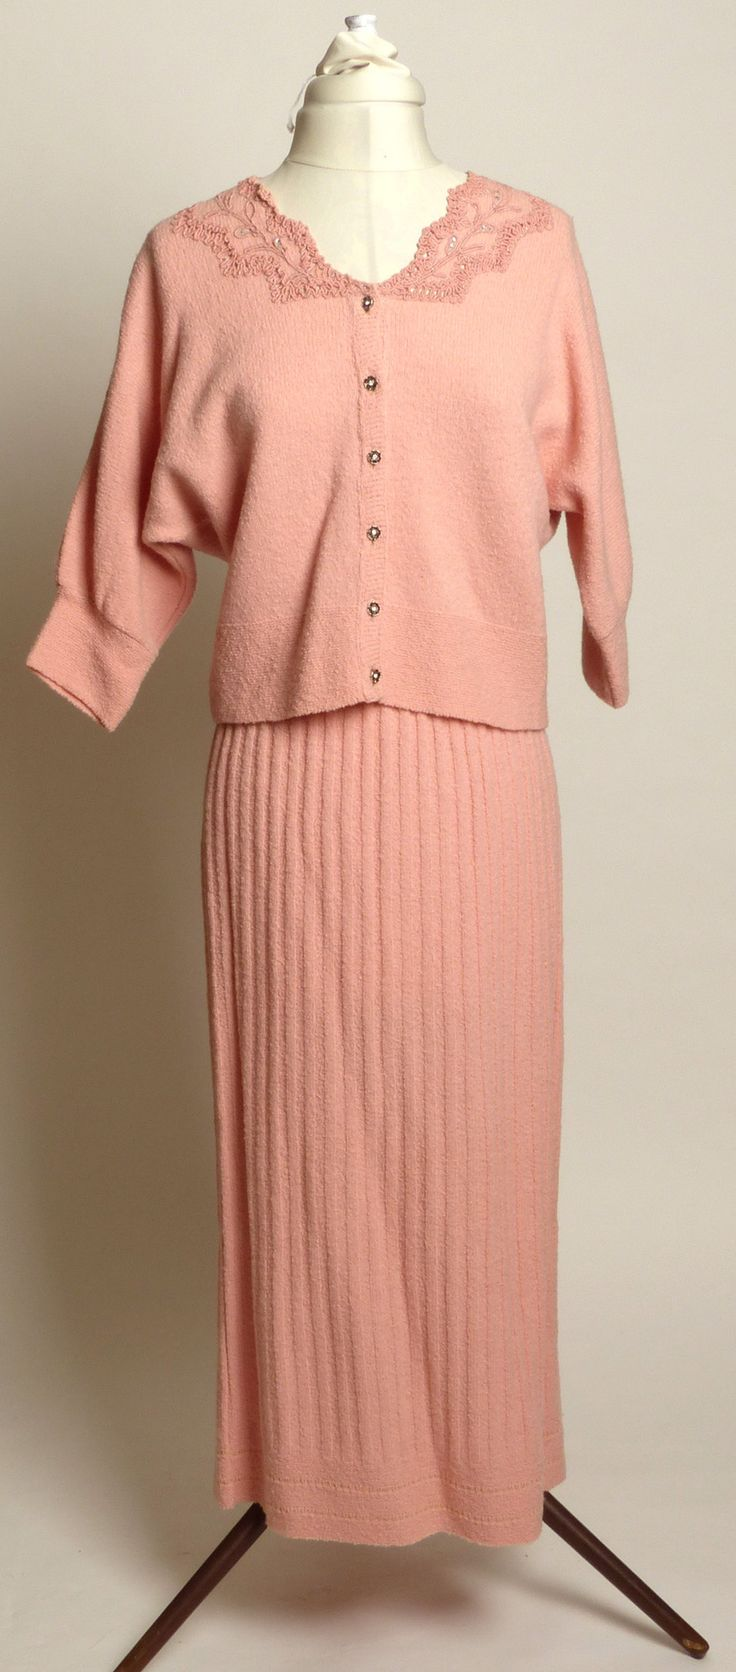 "Circa 1950s Jernat Pale Pink Wool Sweater/Skirt Set - ""Zip-off"" Hem!!"